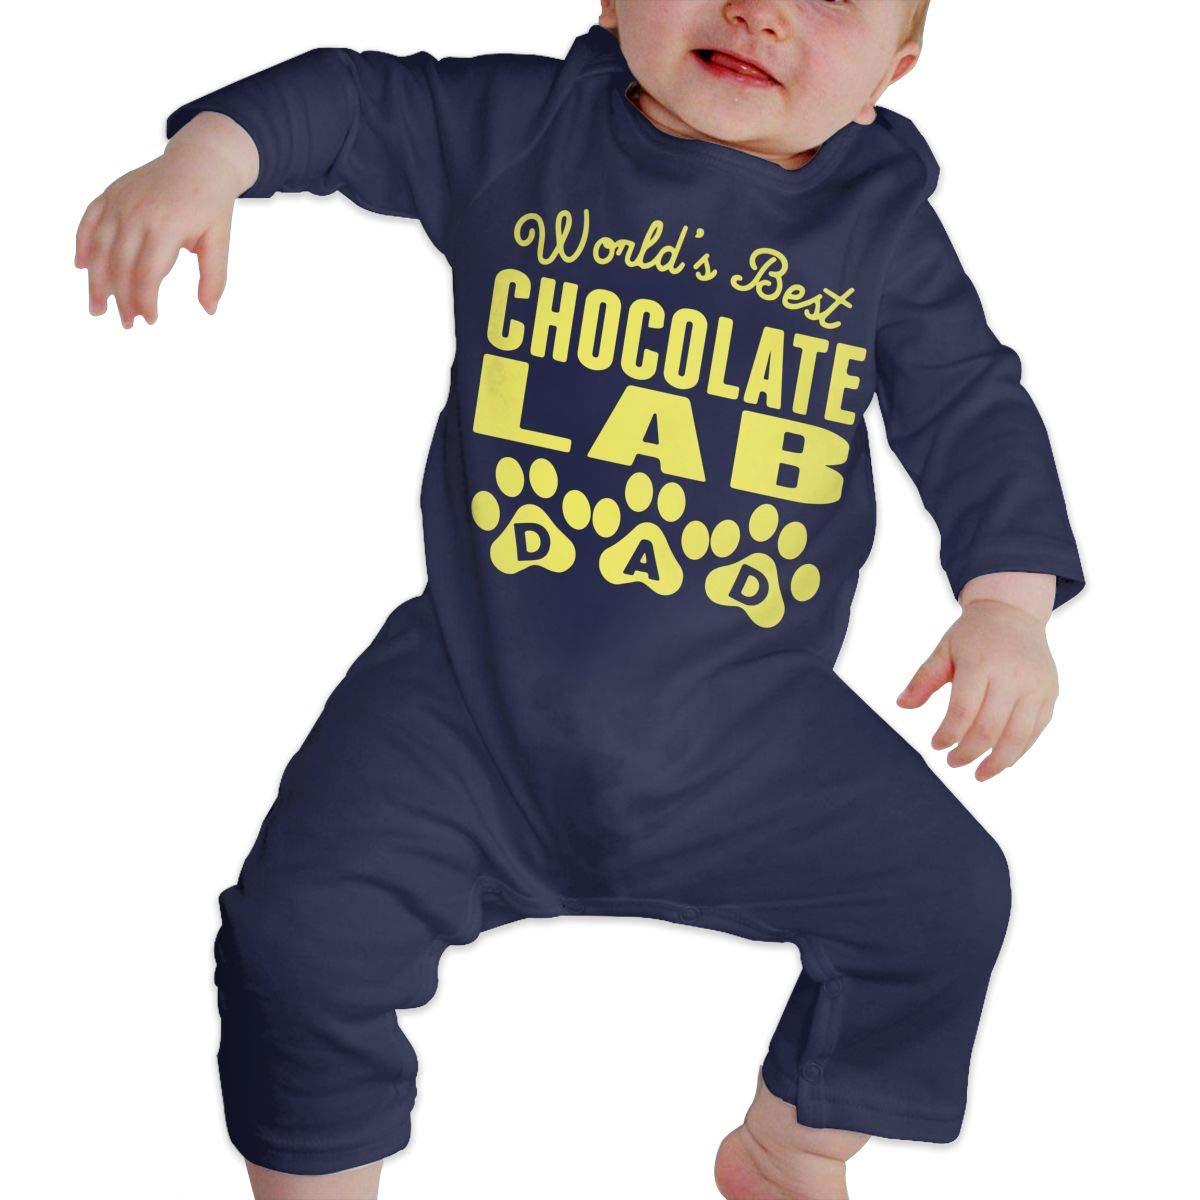 Worlds Best Chocolate Lab Dad Newborn Toddler Baby Sleep and Play Romper Jumpsuit